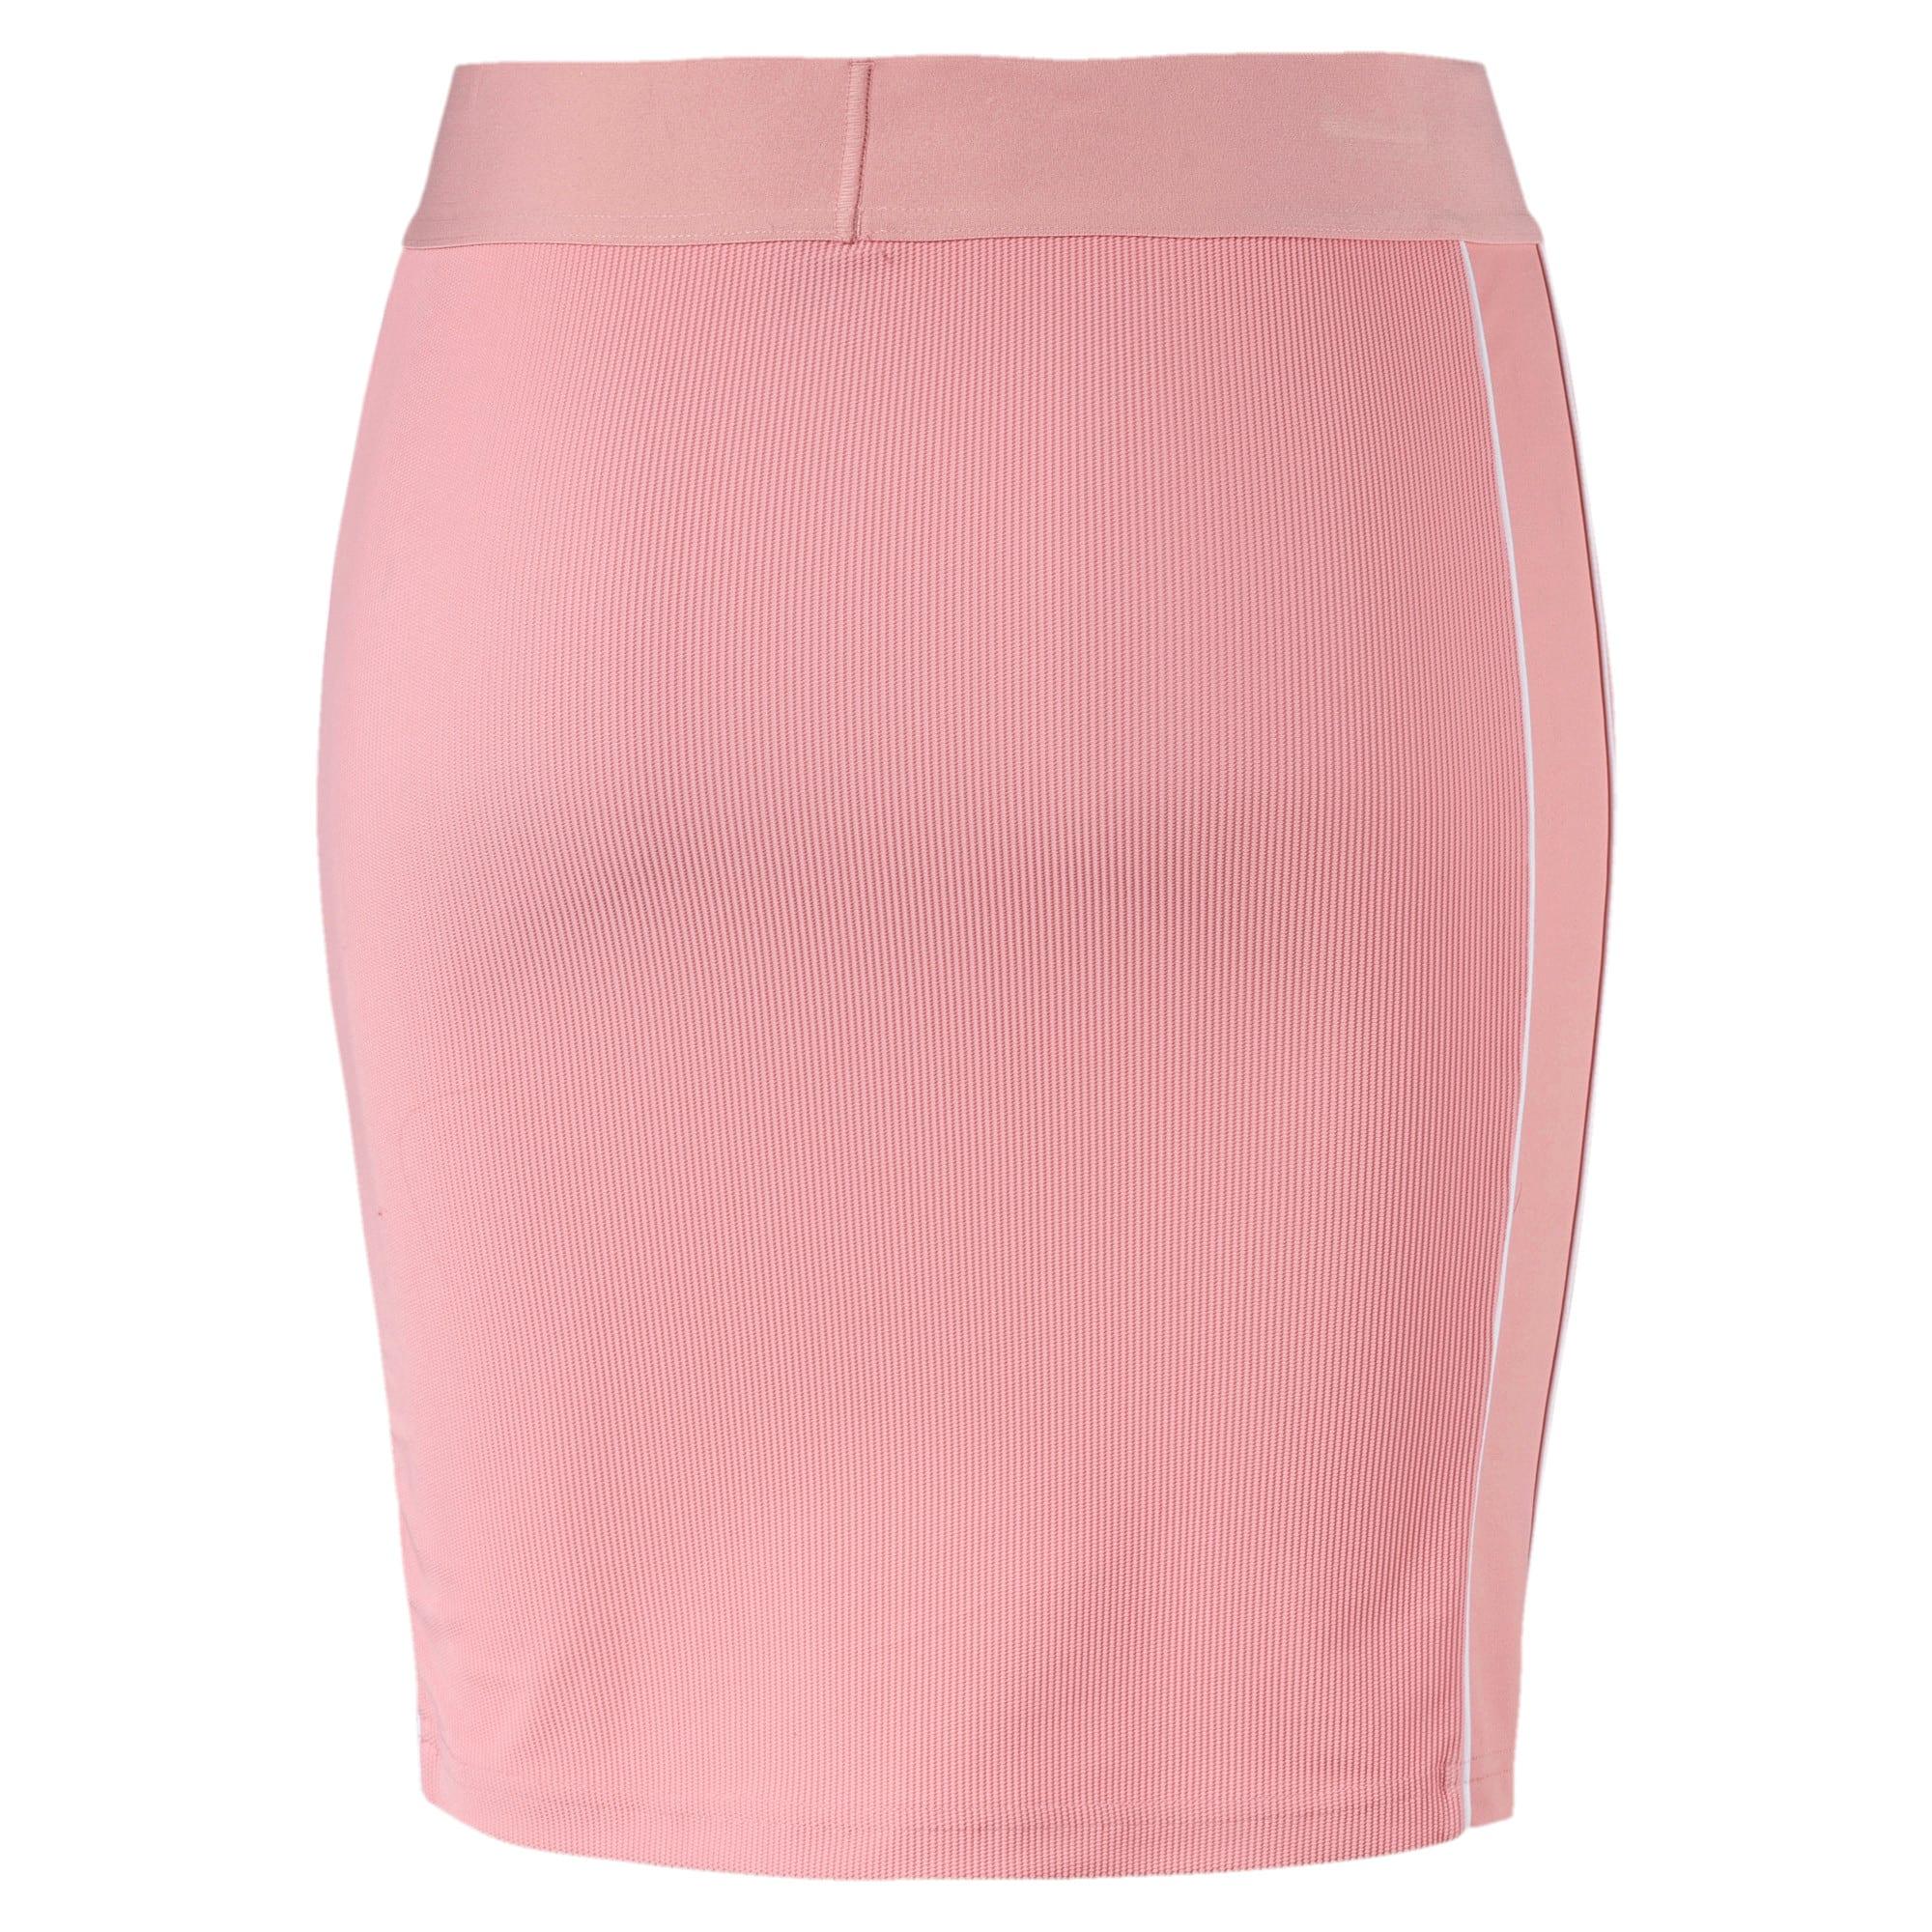 Thumbnail 5 of Classics Rib Women's Skirt, Bridal Rose, medium